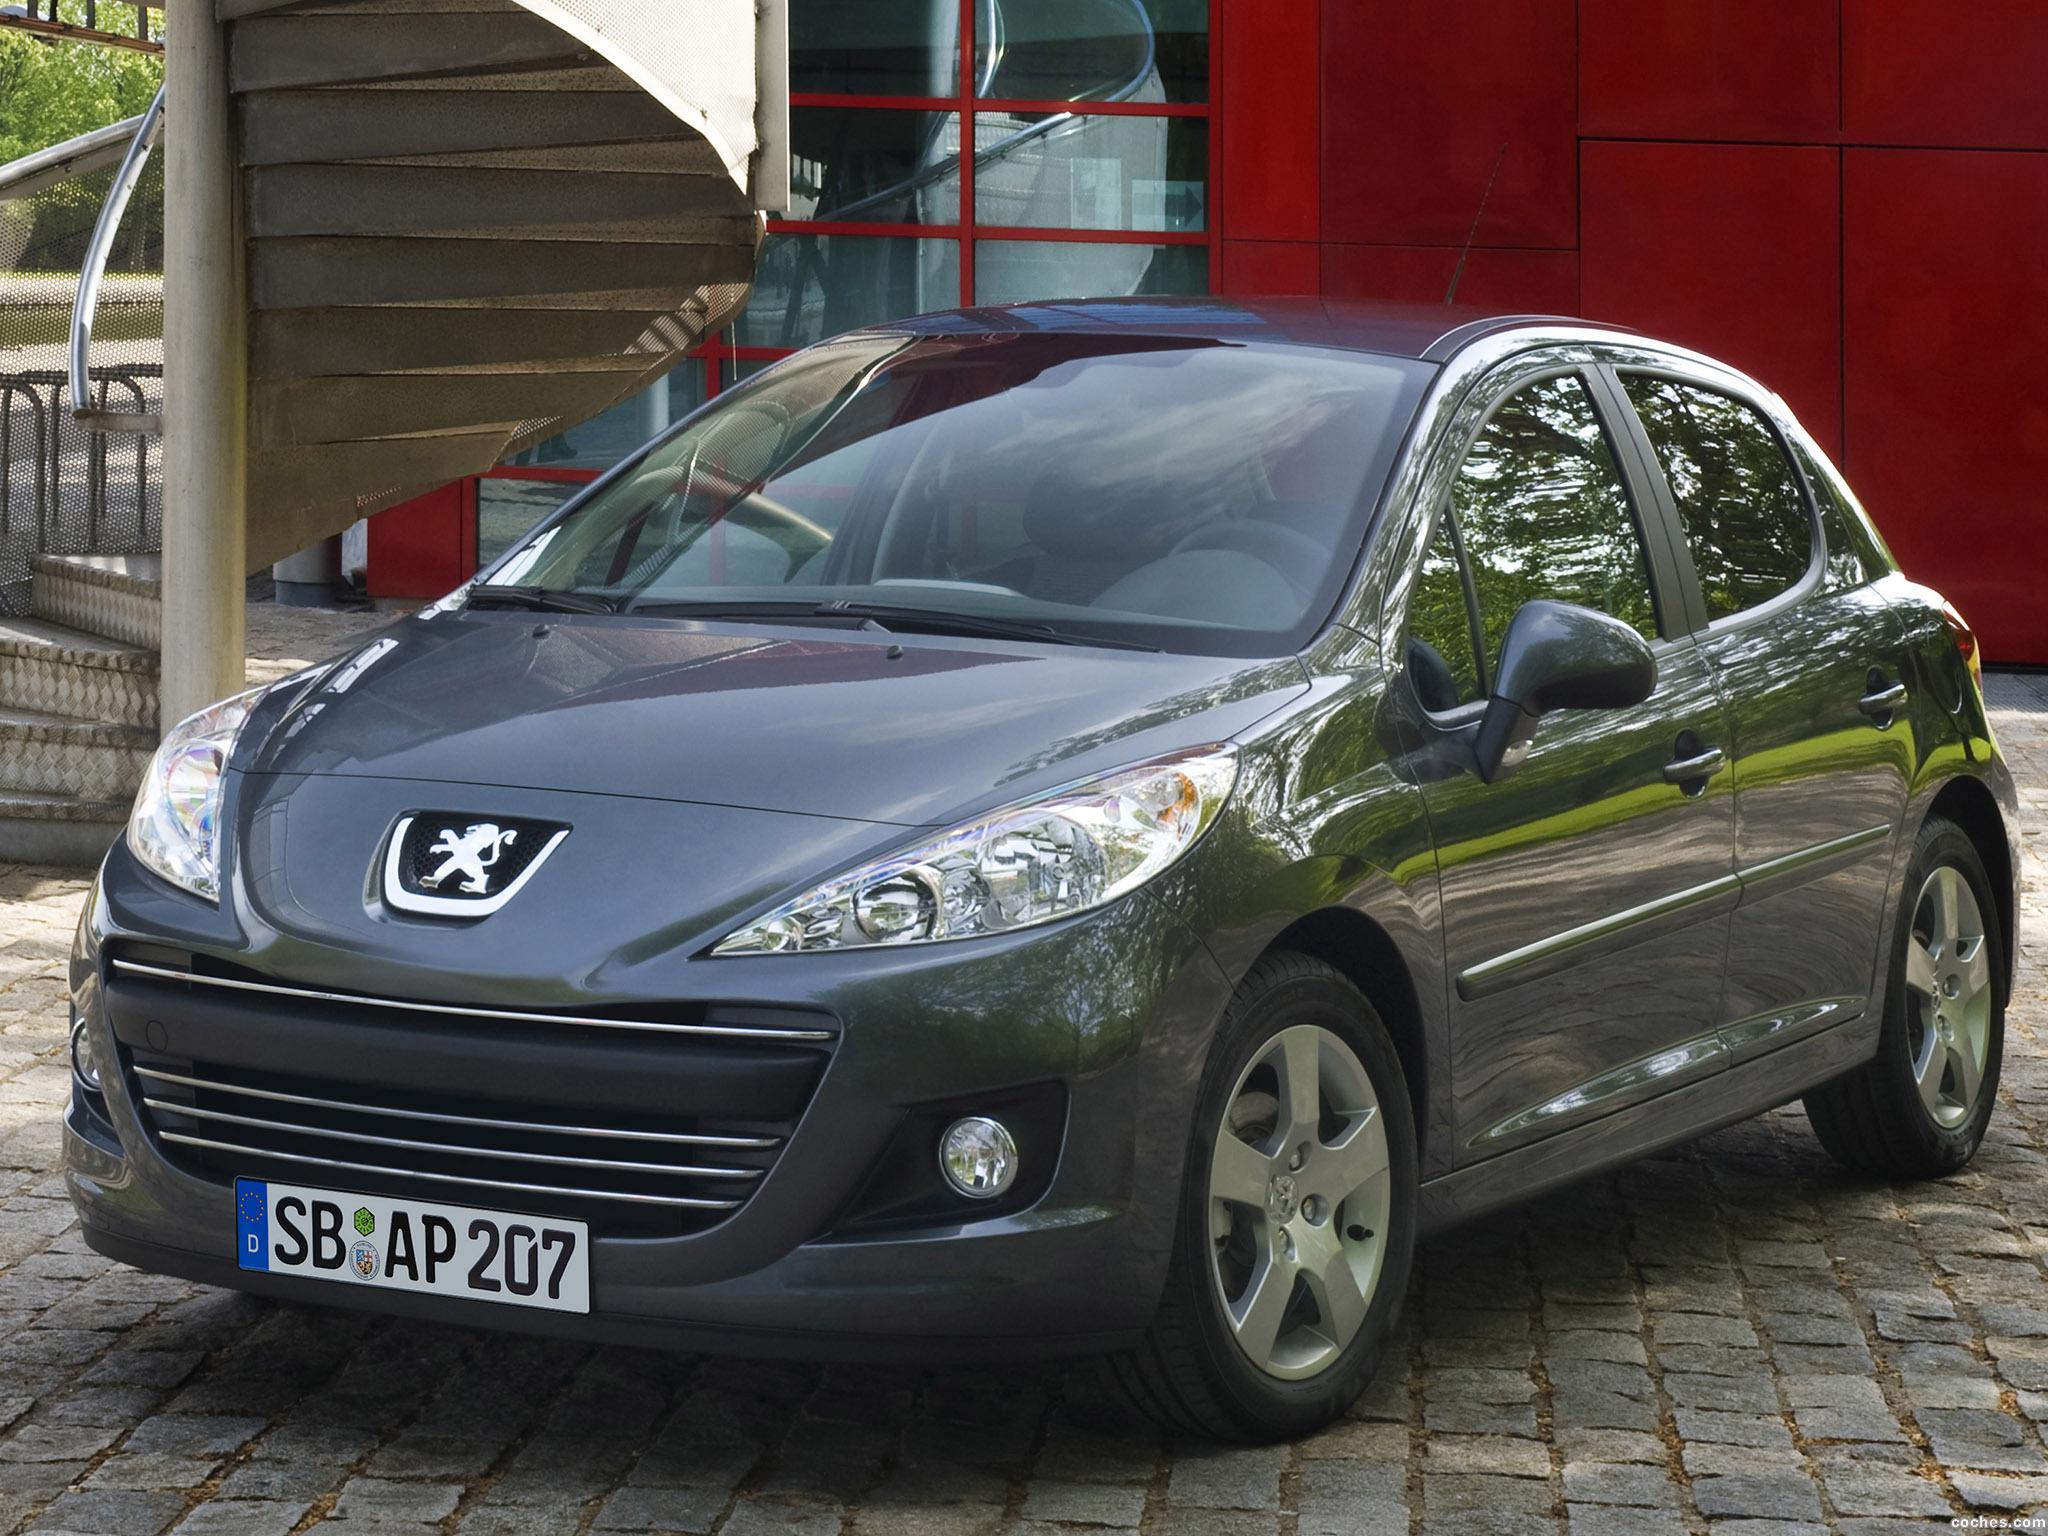 Foto 0 de Peugeot 207 5 puertas 2009